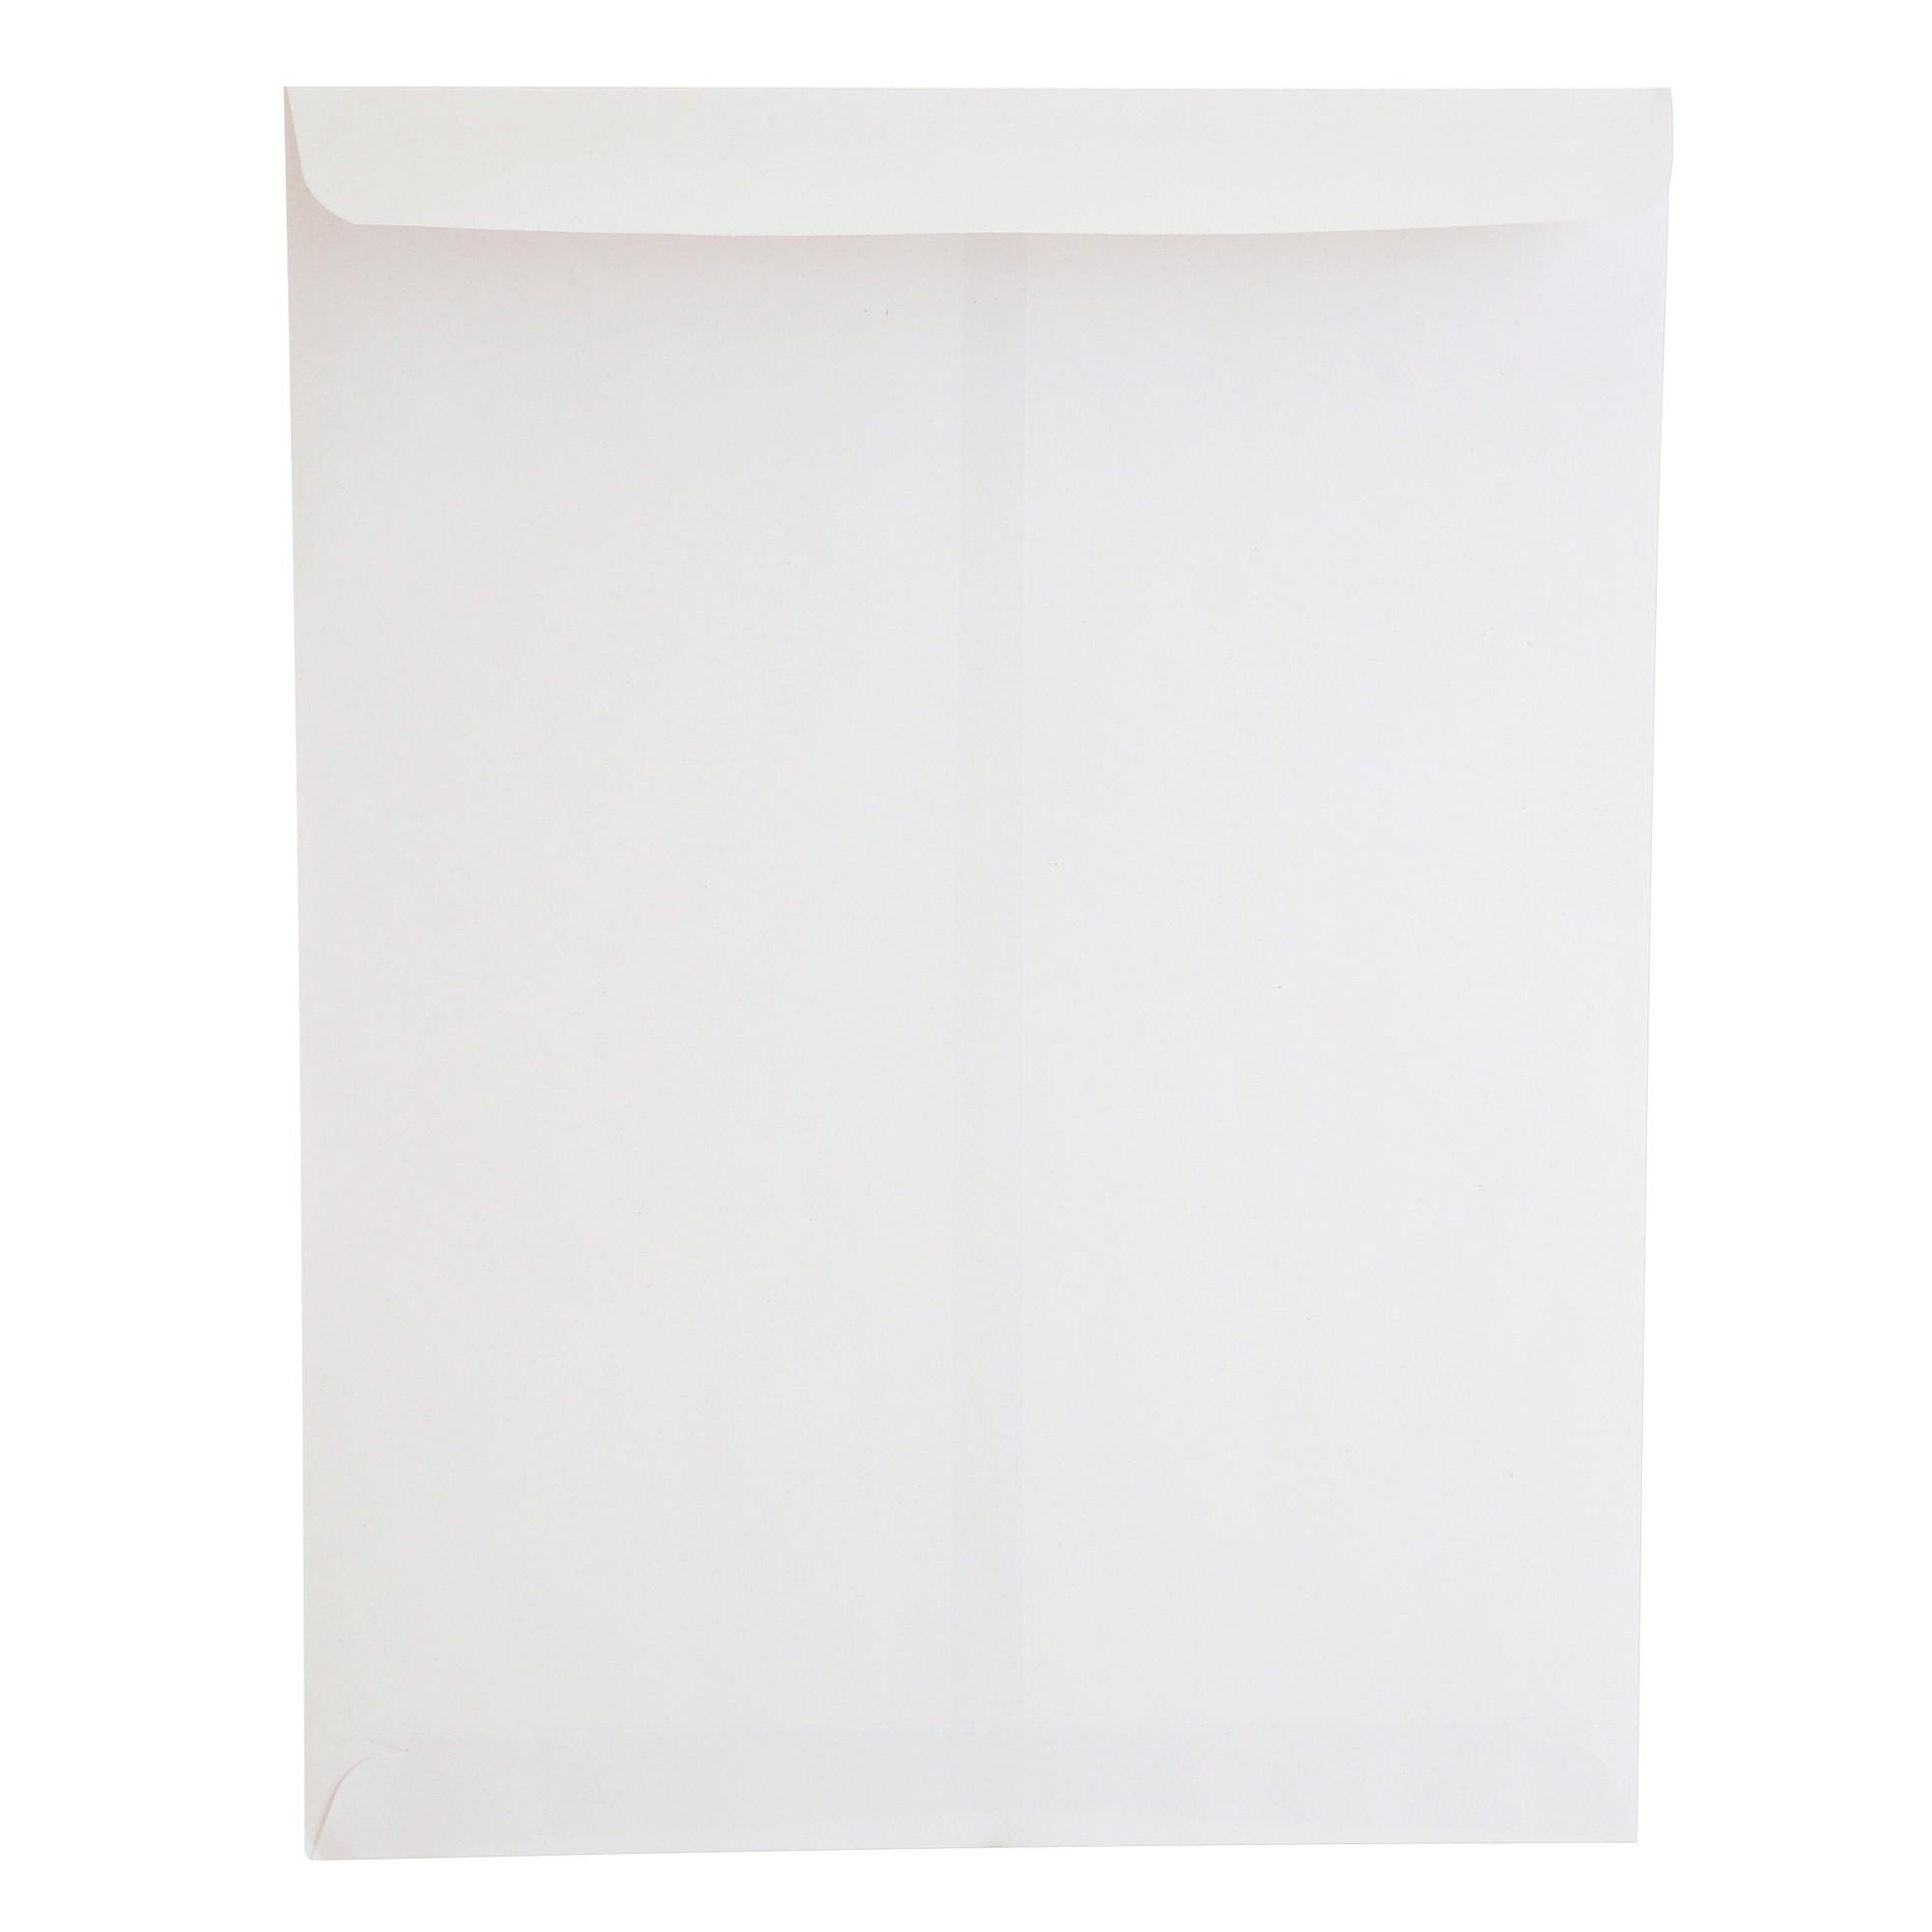 Catalog Envelope, Center Seam, 10 x 13, White, 250/Box